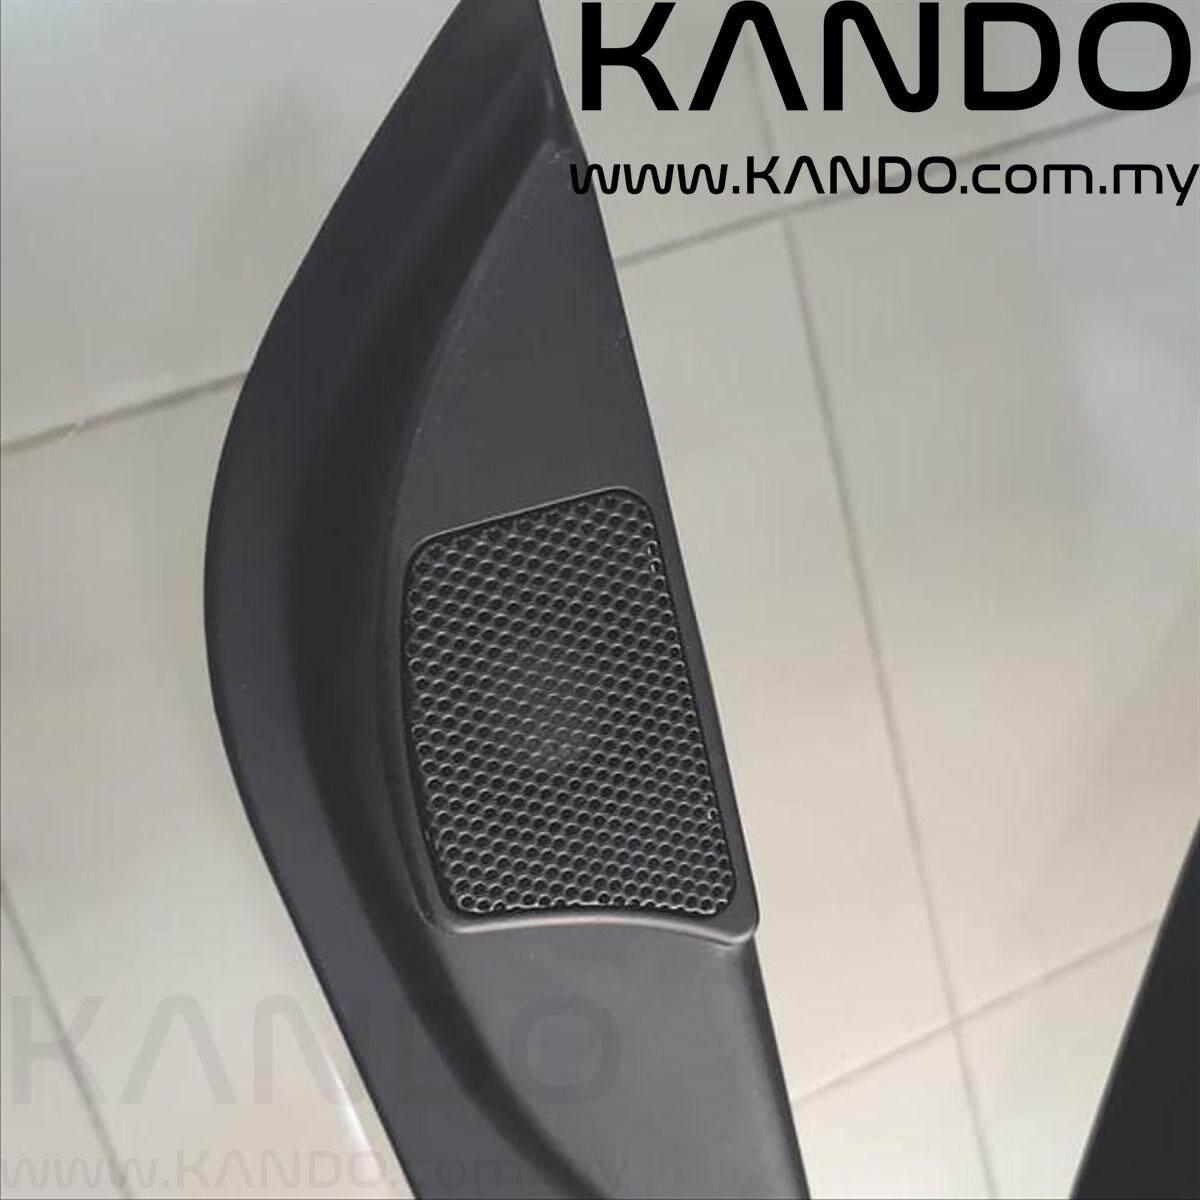 AXIA Tweeter Cover Perodua Axia Tweeter Refitting Door Angle Tweeter Housing Cover Stereo Installation - One Pair